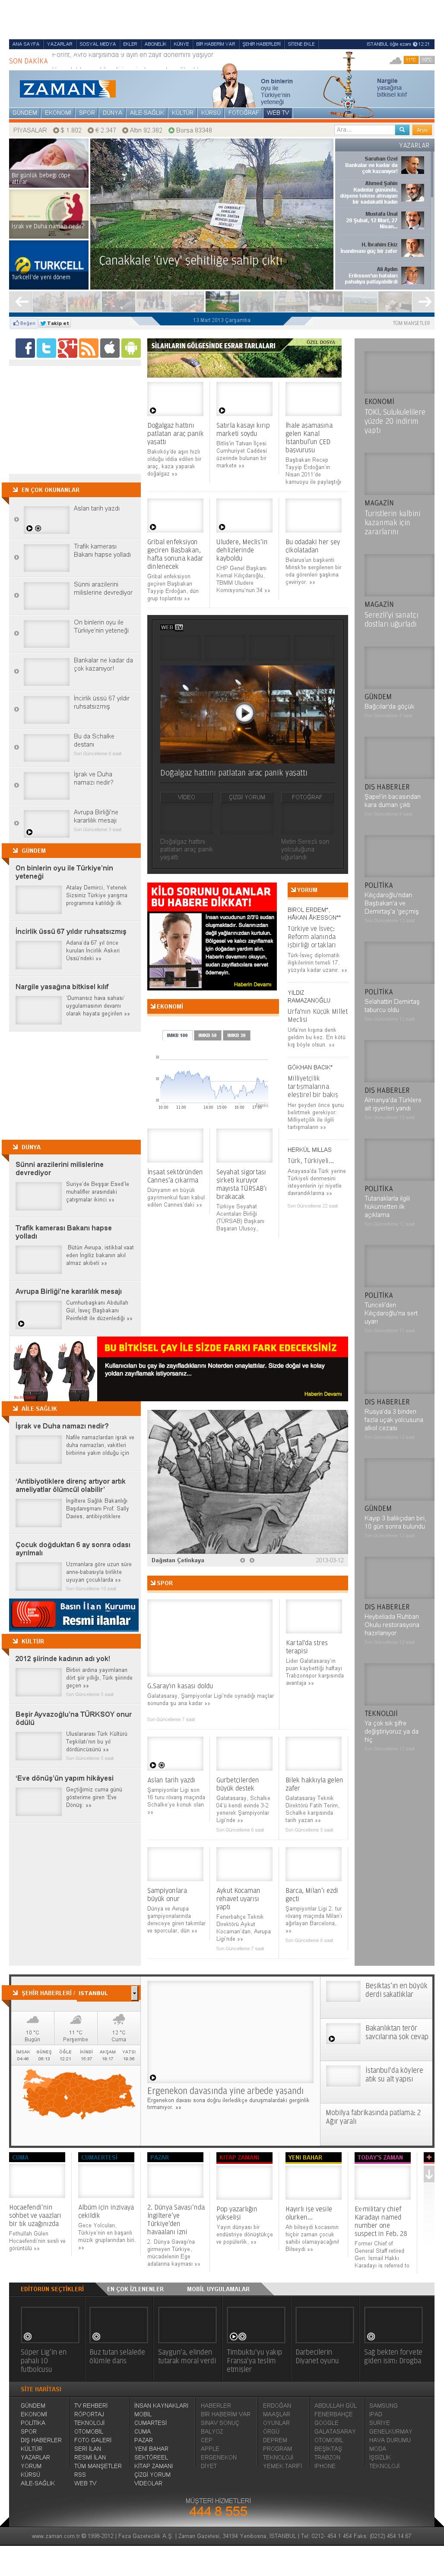 Zaman Online at Wednesday March 13, 2013, 7:25 a.m. UTC